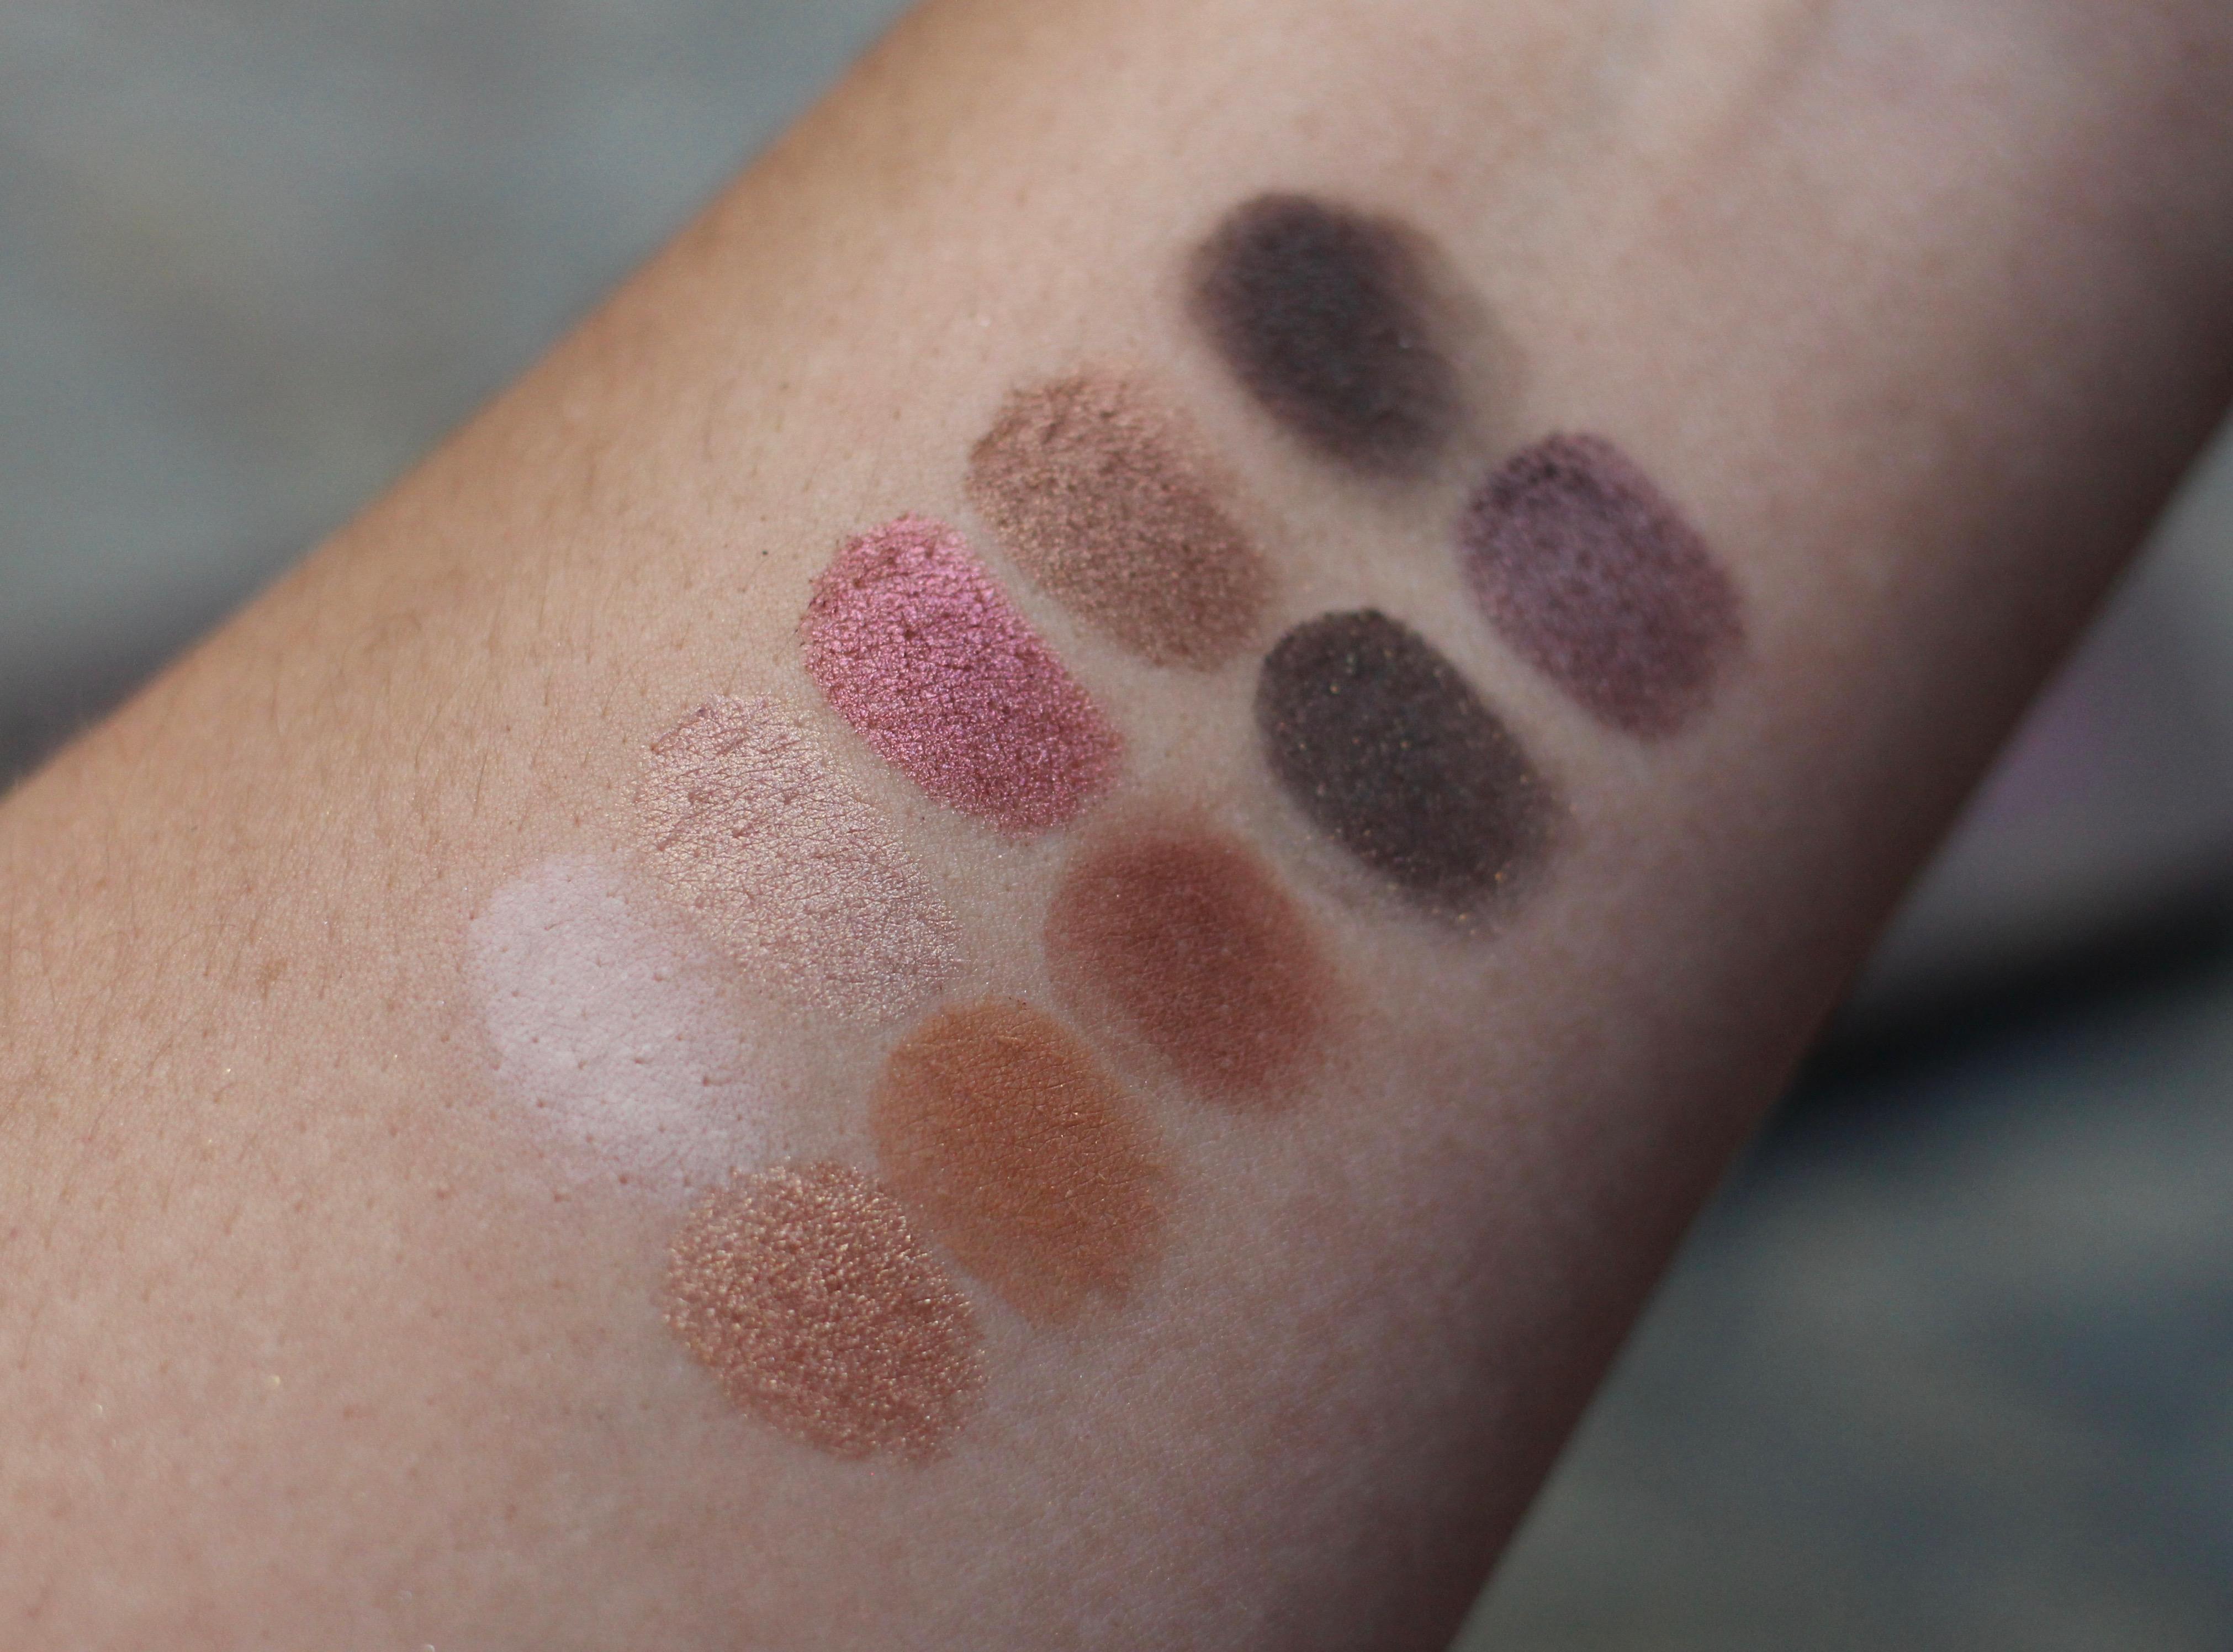 Zoeva Cocoa Eyeshadow Palette